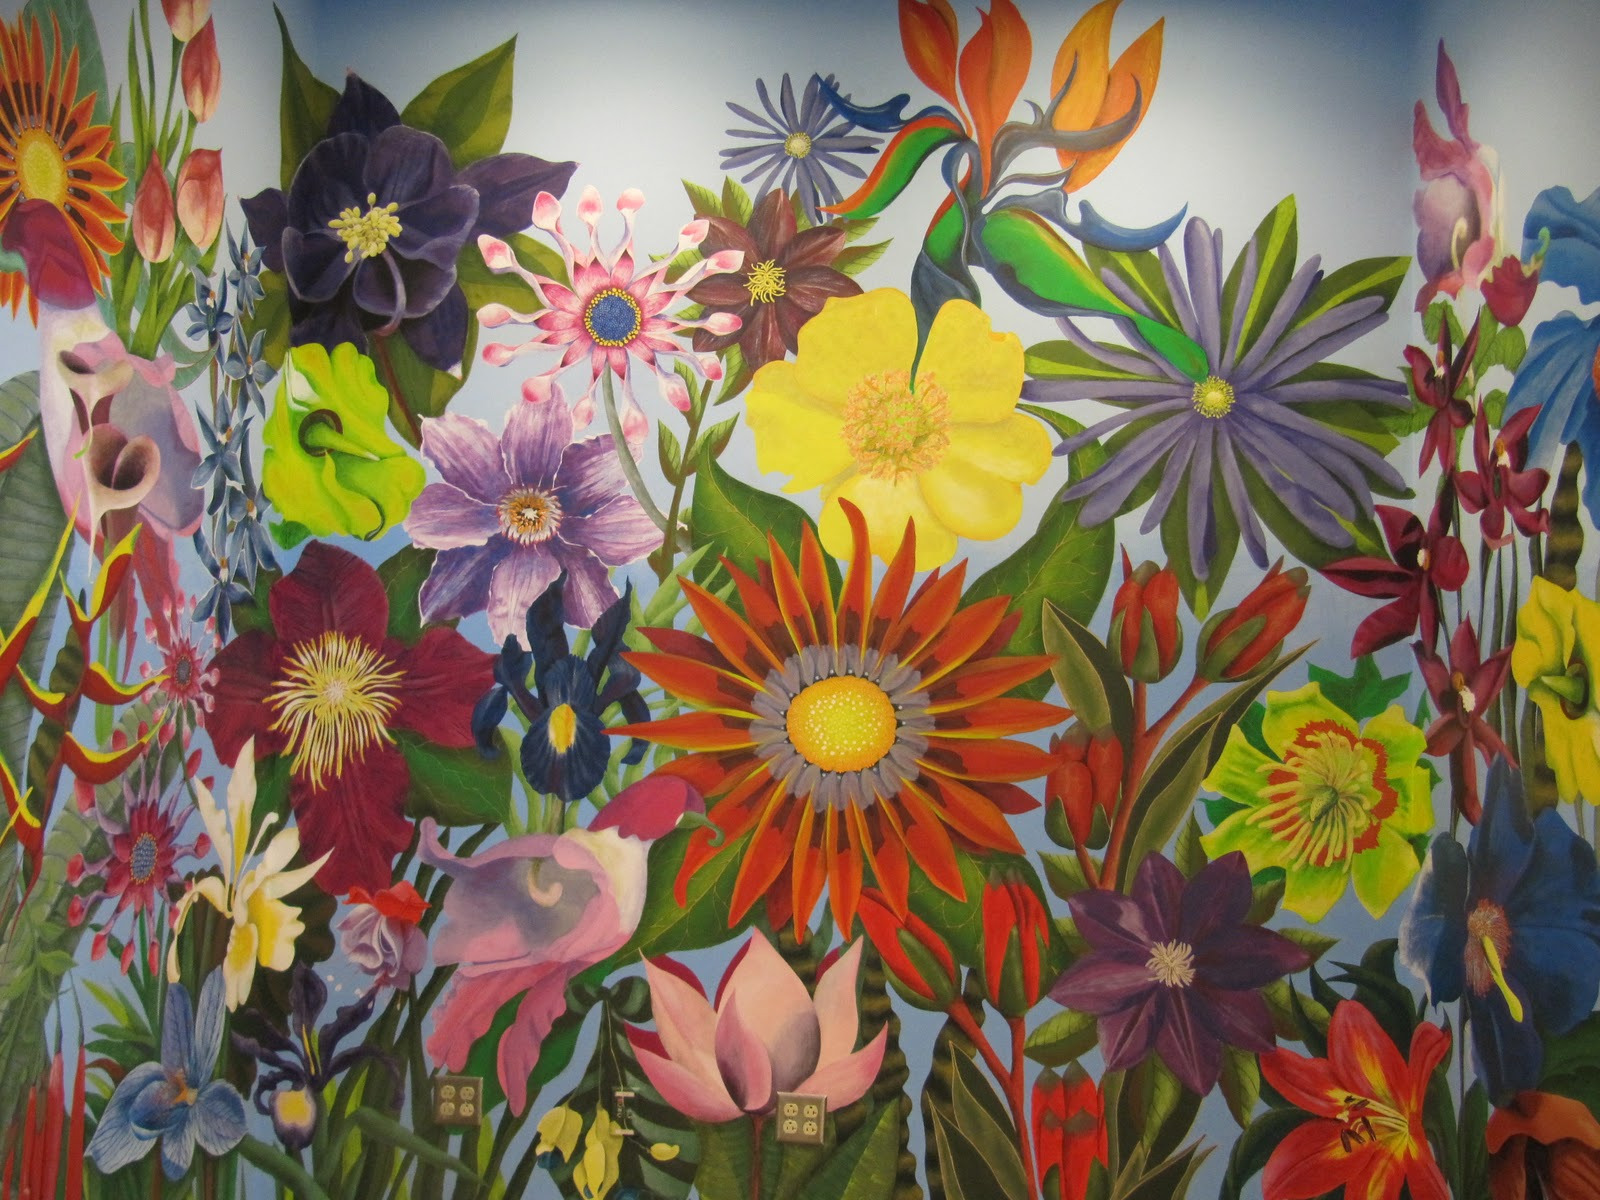 Cre8tive Daze: Flower Mural